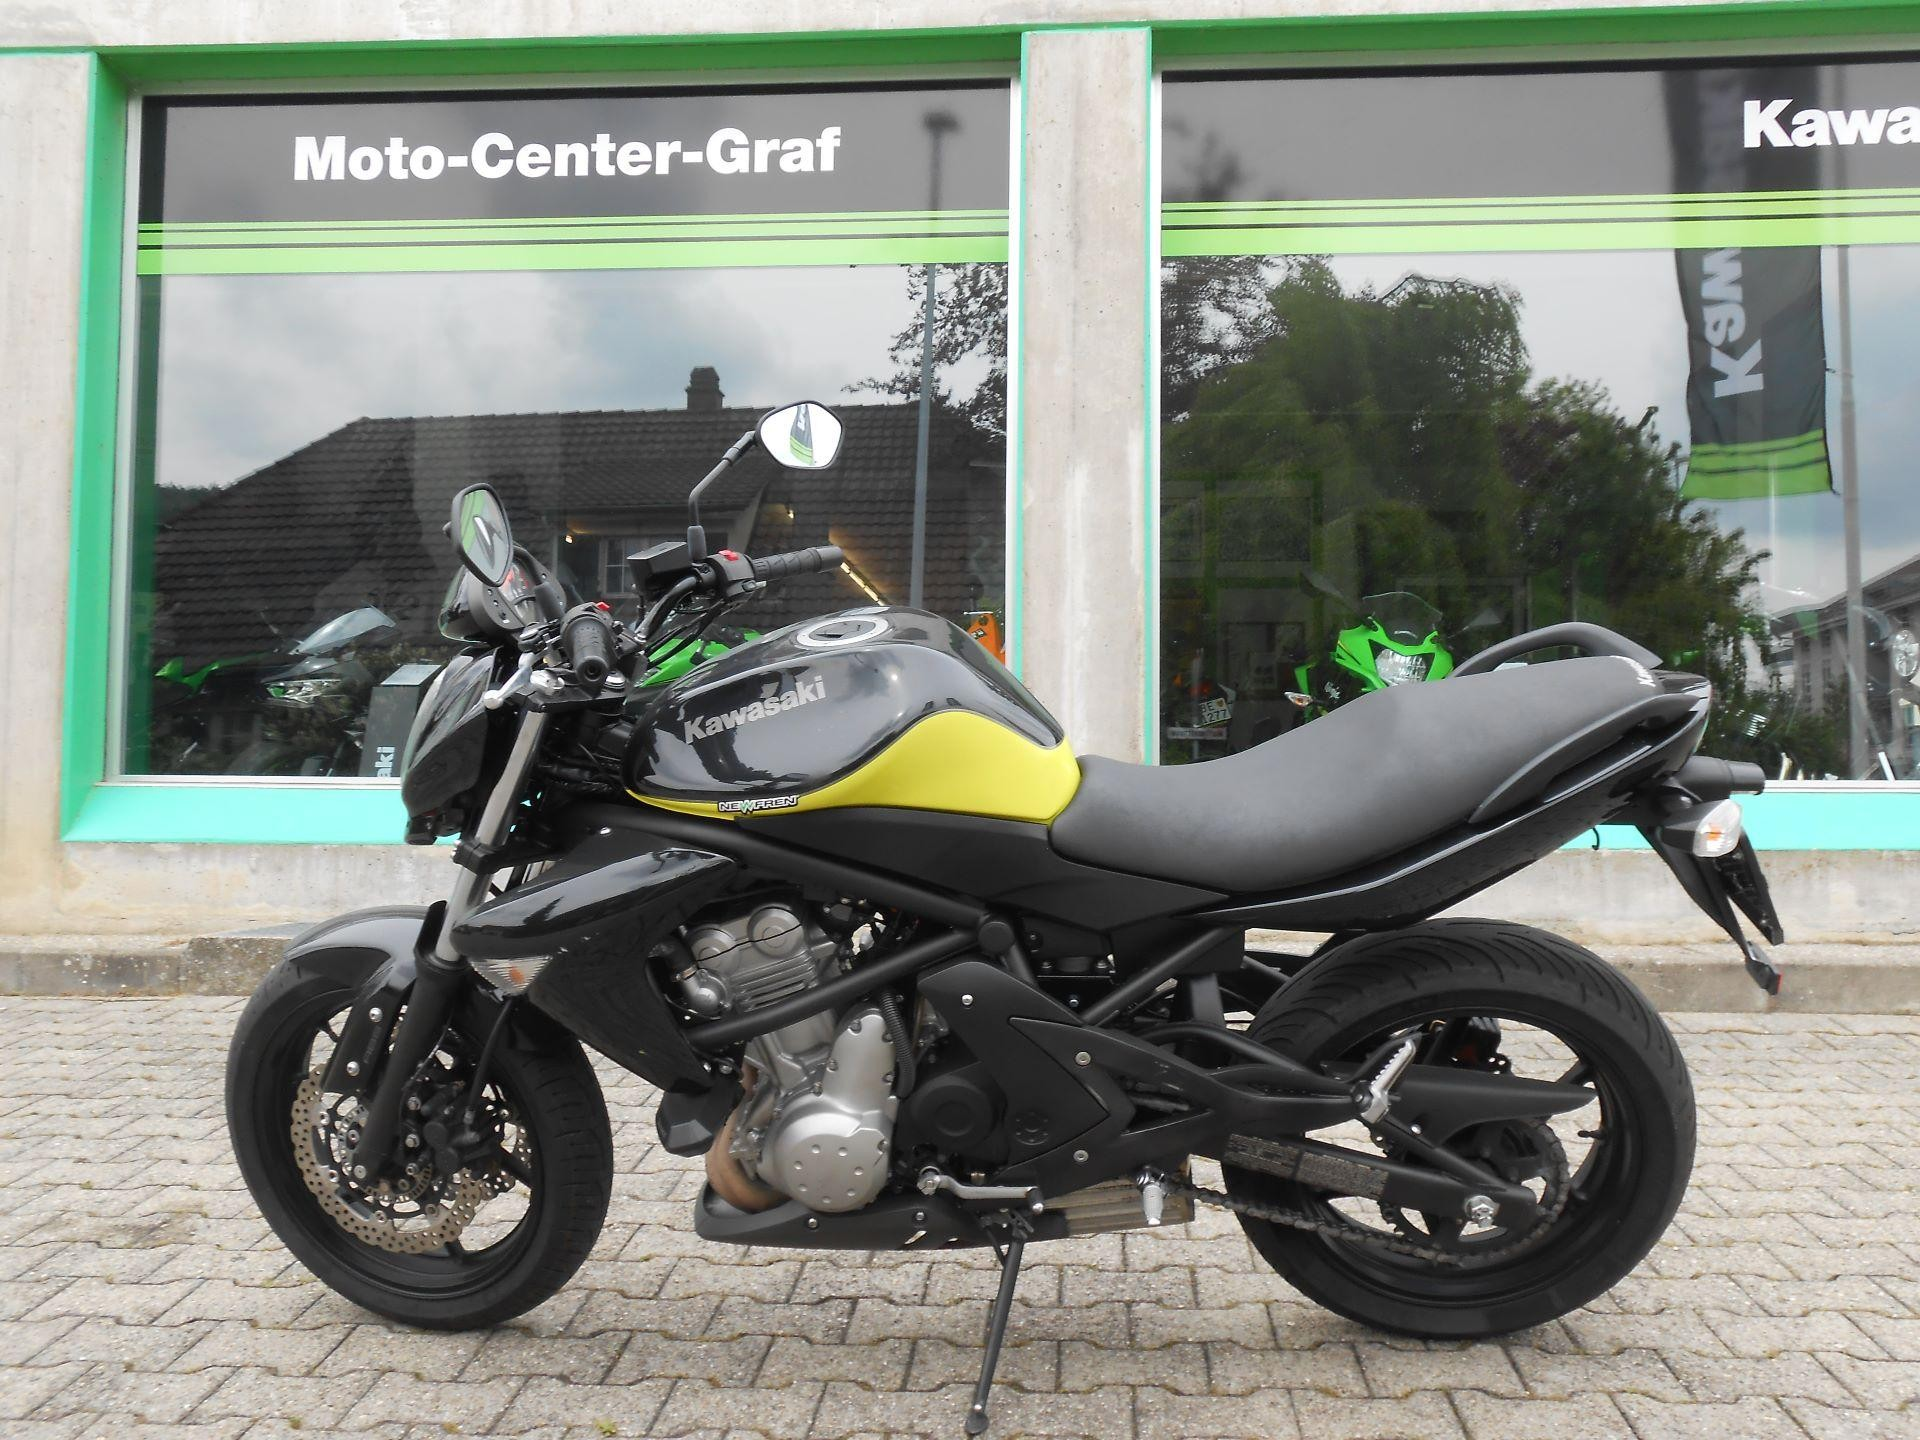 Motorrad Occasion Kaufen Kawasaki Er 6n Moto Center Graf Aegerten Id